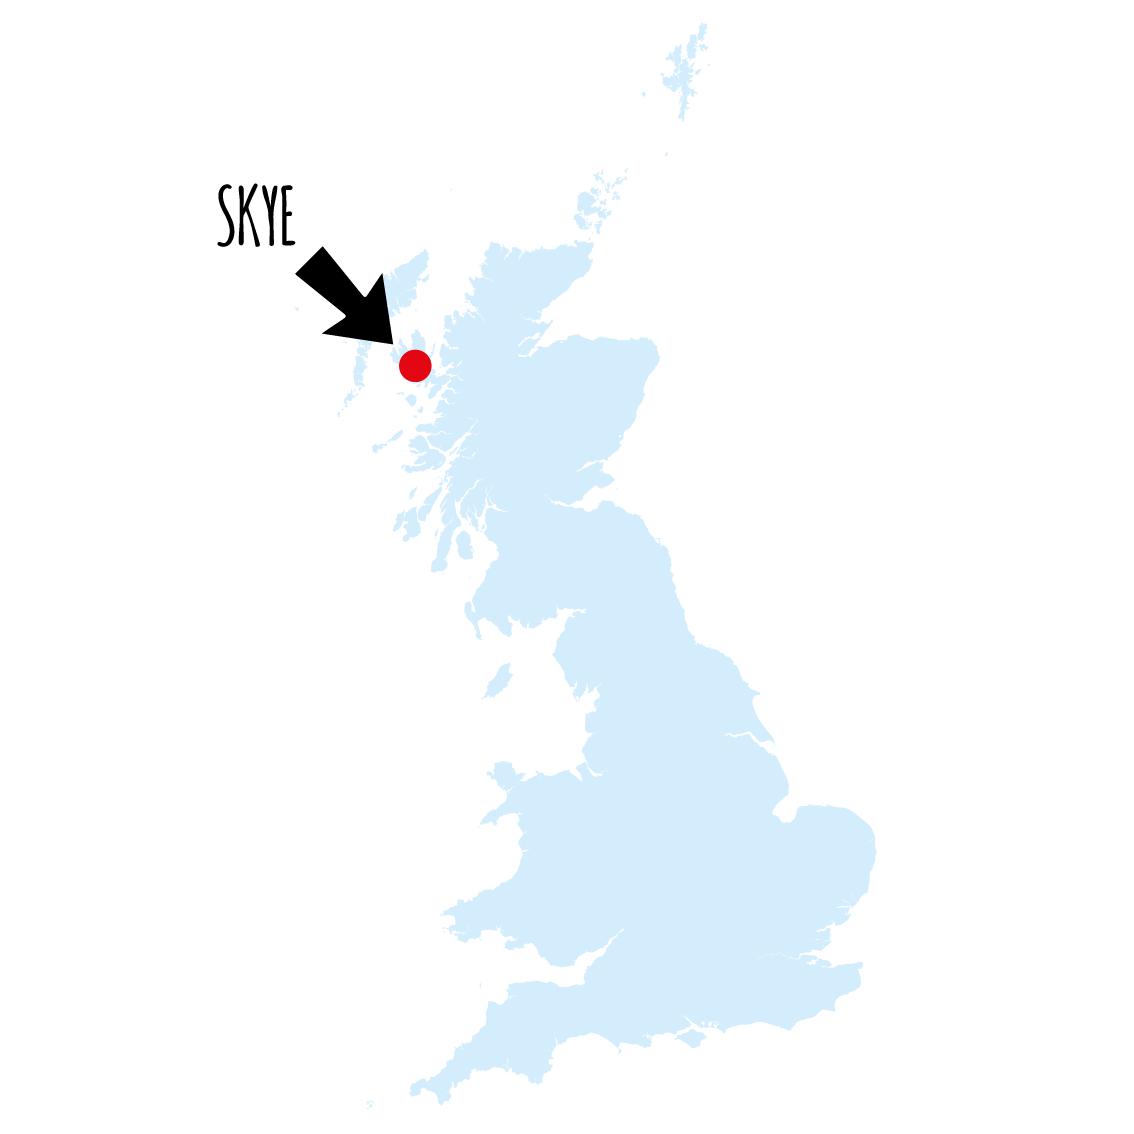 skye-map.png